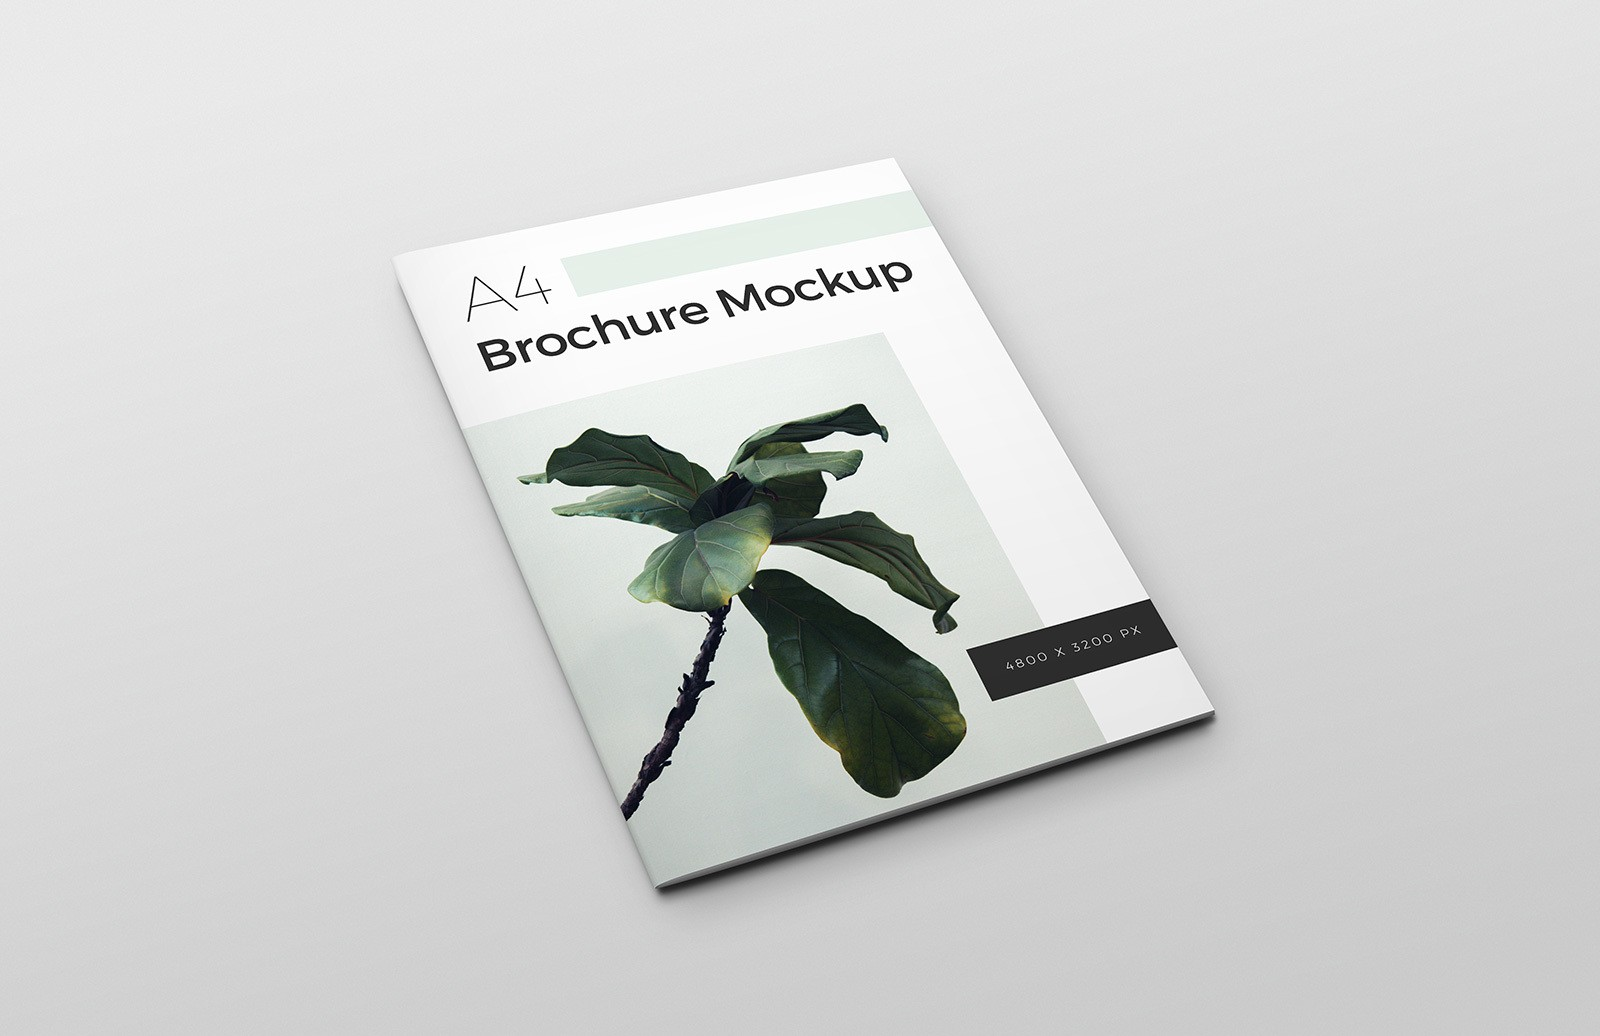 A4 Brochure Mockup Preview 1